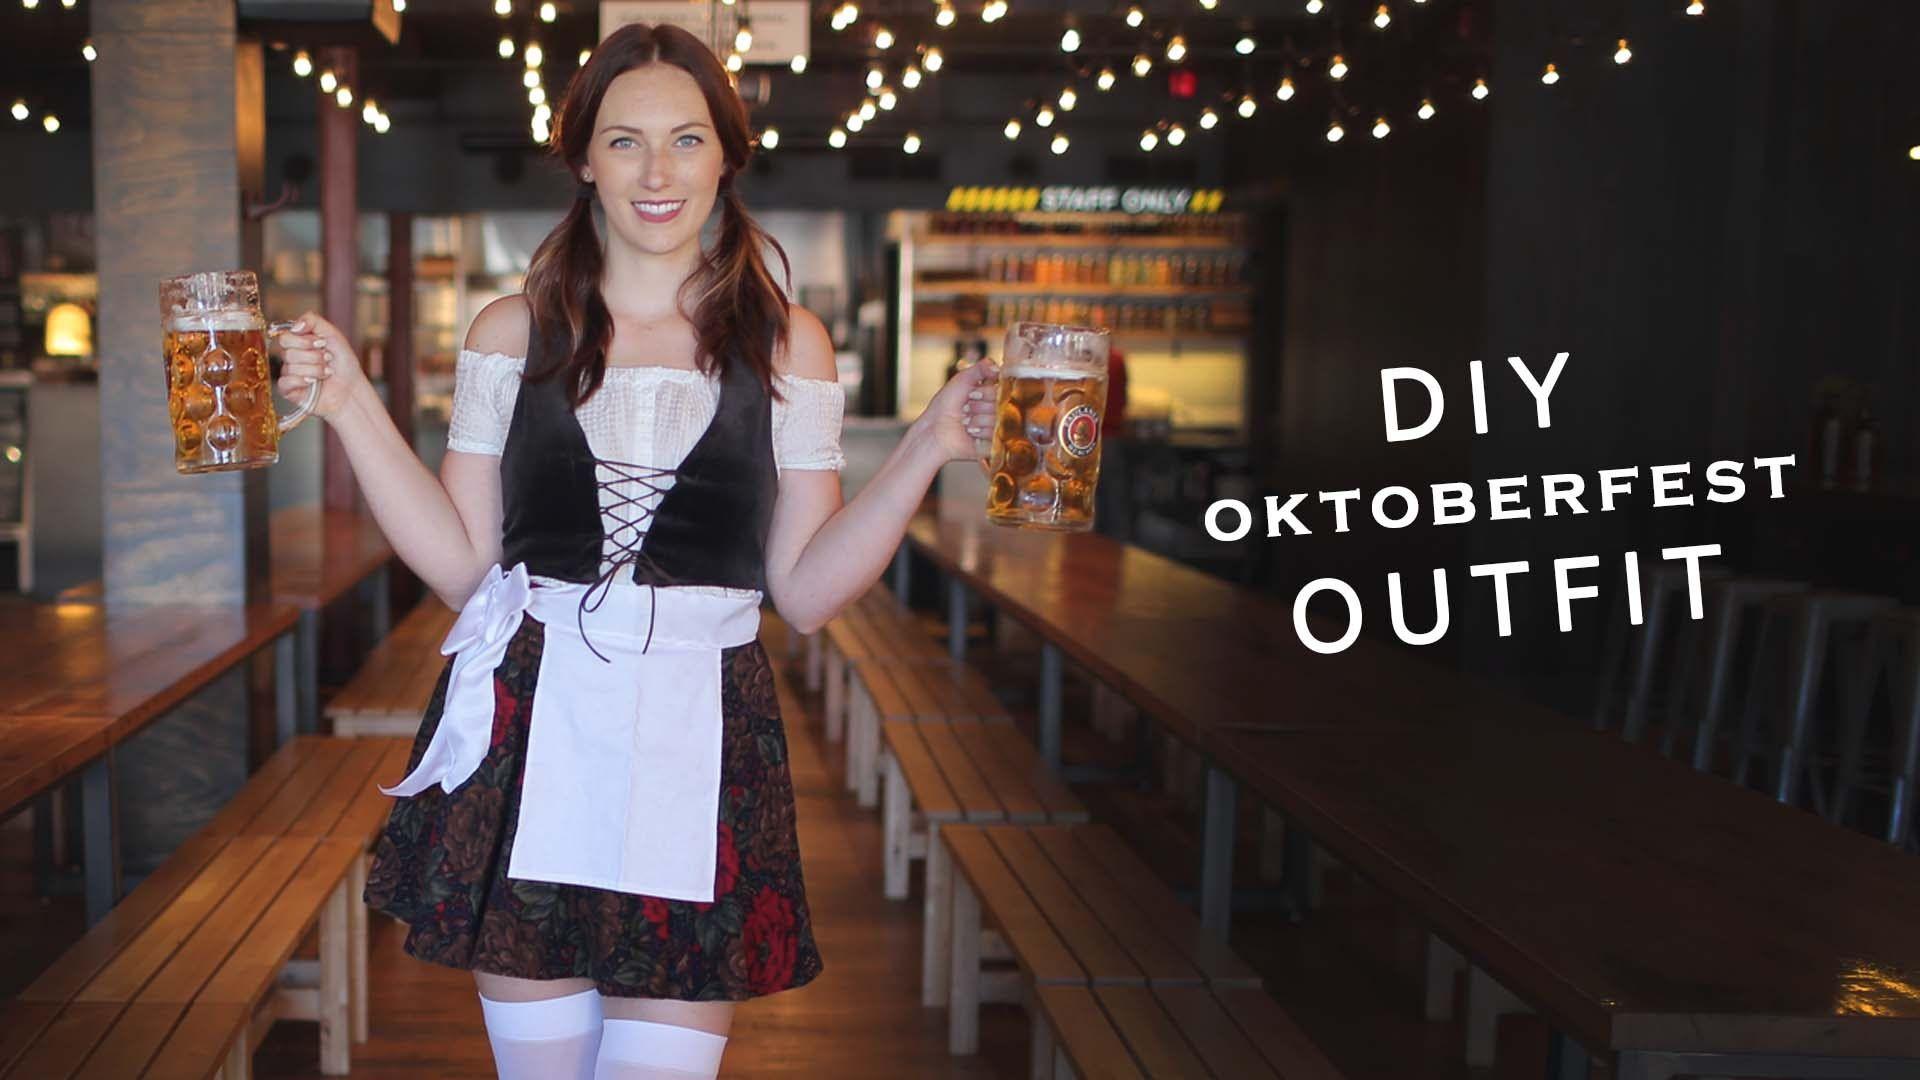 Diy Oktoberfest Dress The Sorry Girls Oktoberfest Outfit Wonder Woman Costume Diy Oktoberfest Costume